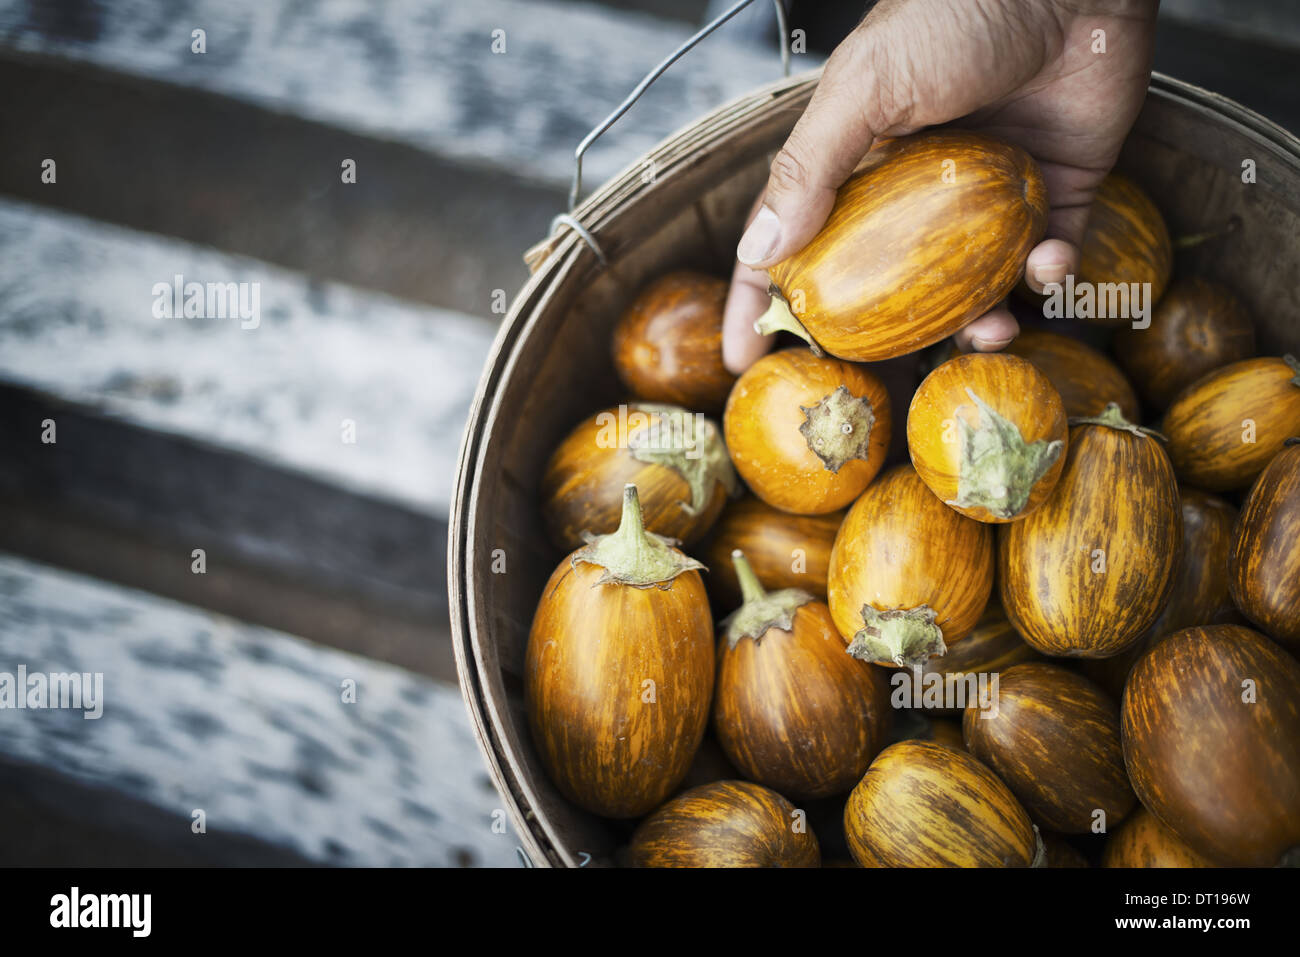 Turkish Stockfotos & Turkish Bilder - Alamy